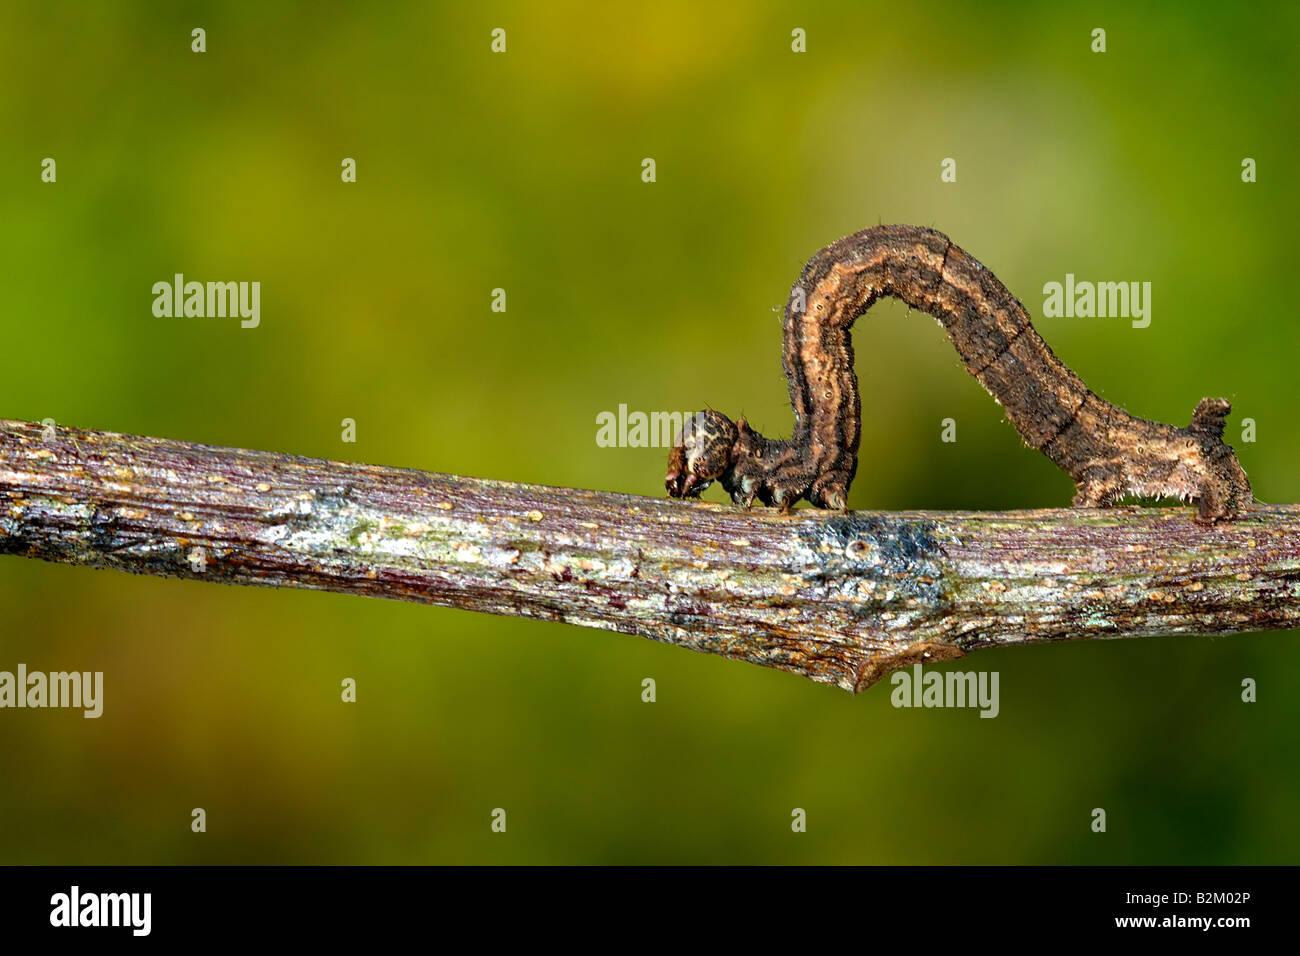 caterpillar, acherontia, larva, atropos, animal, butterfly, insect, insects, animal, bug, lepidopteran, ugly, lagarta, - Stock Image